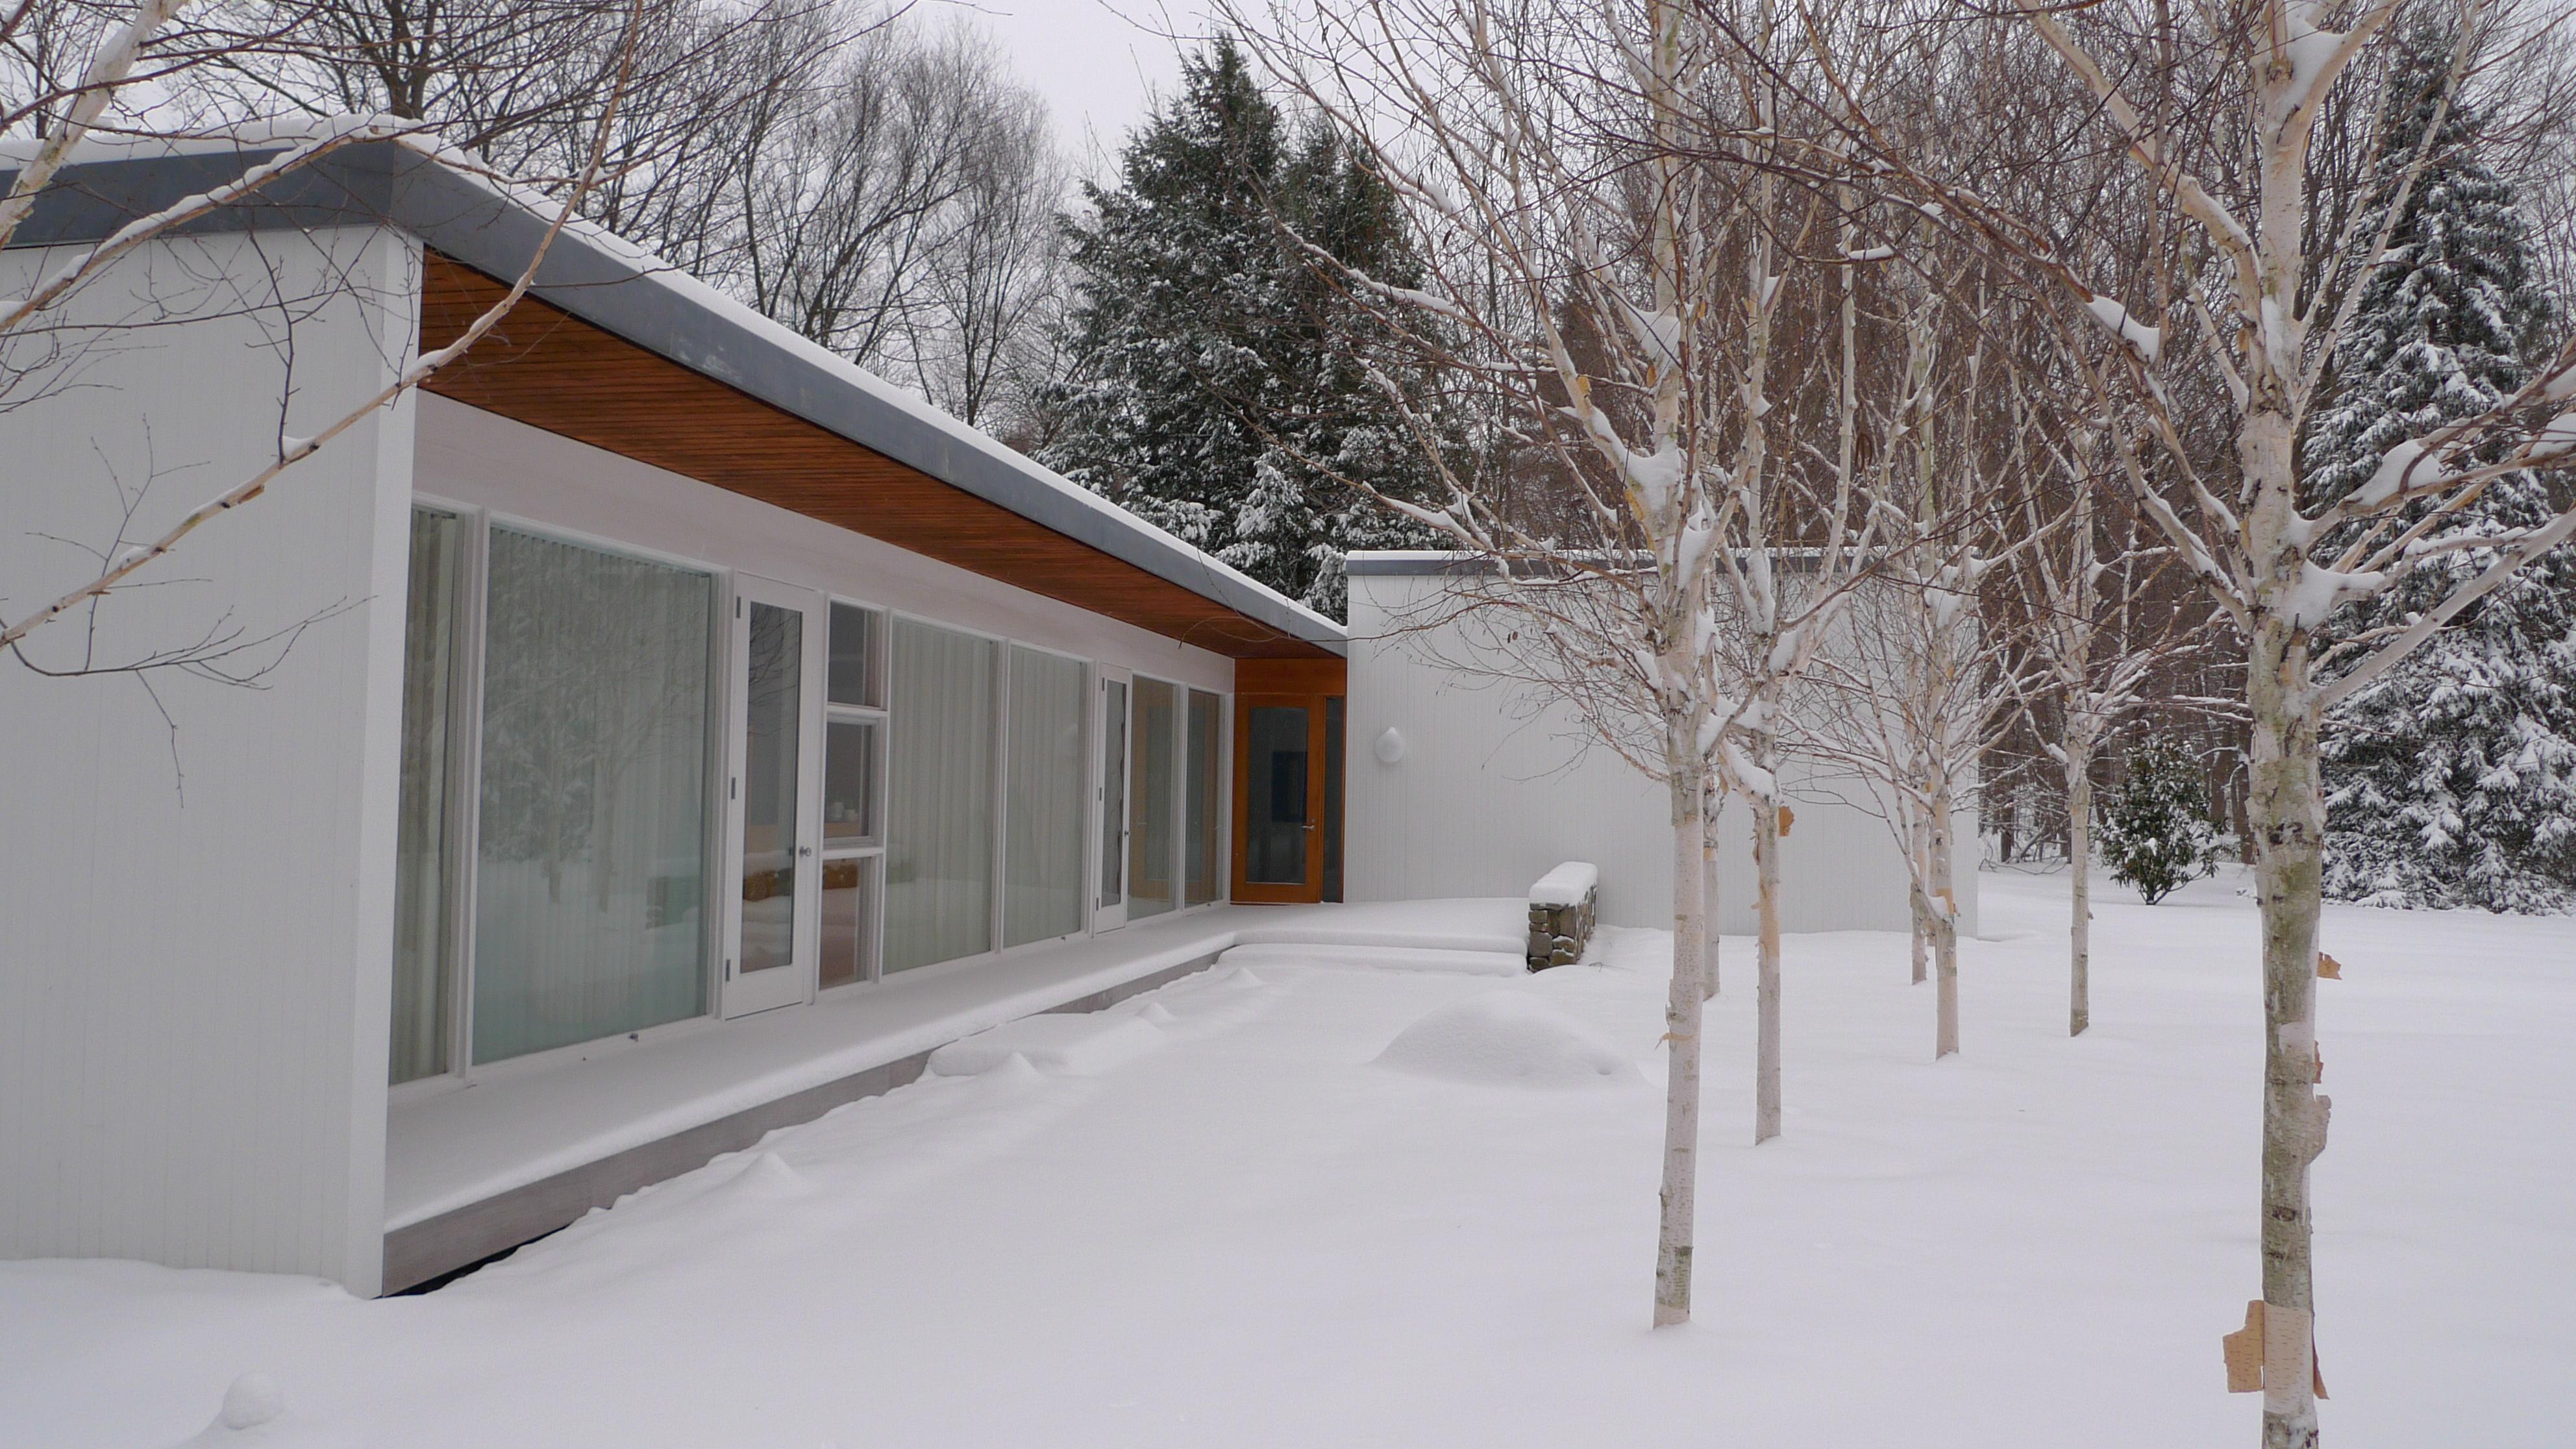 the-tatum-house-by-architect-hugh-smallen-1962-photo-by-craig-bloom-snow_